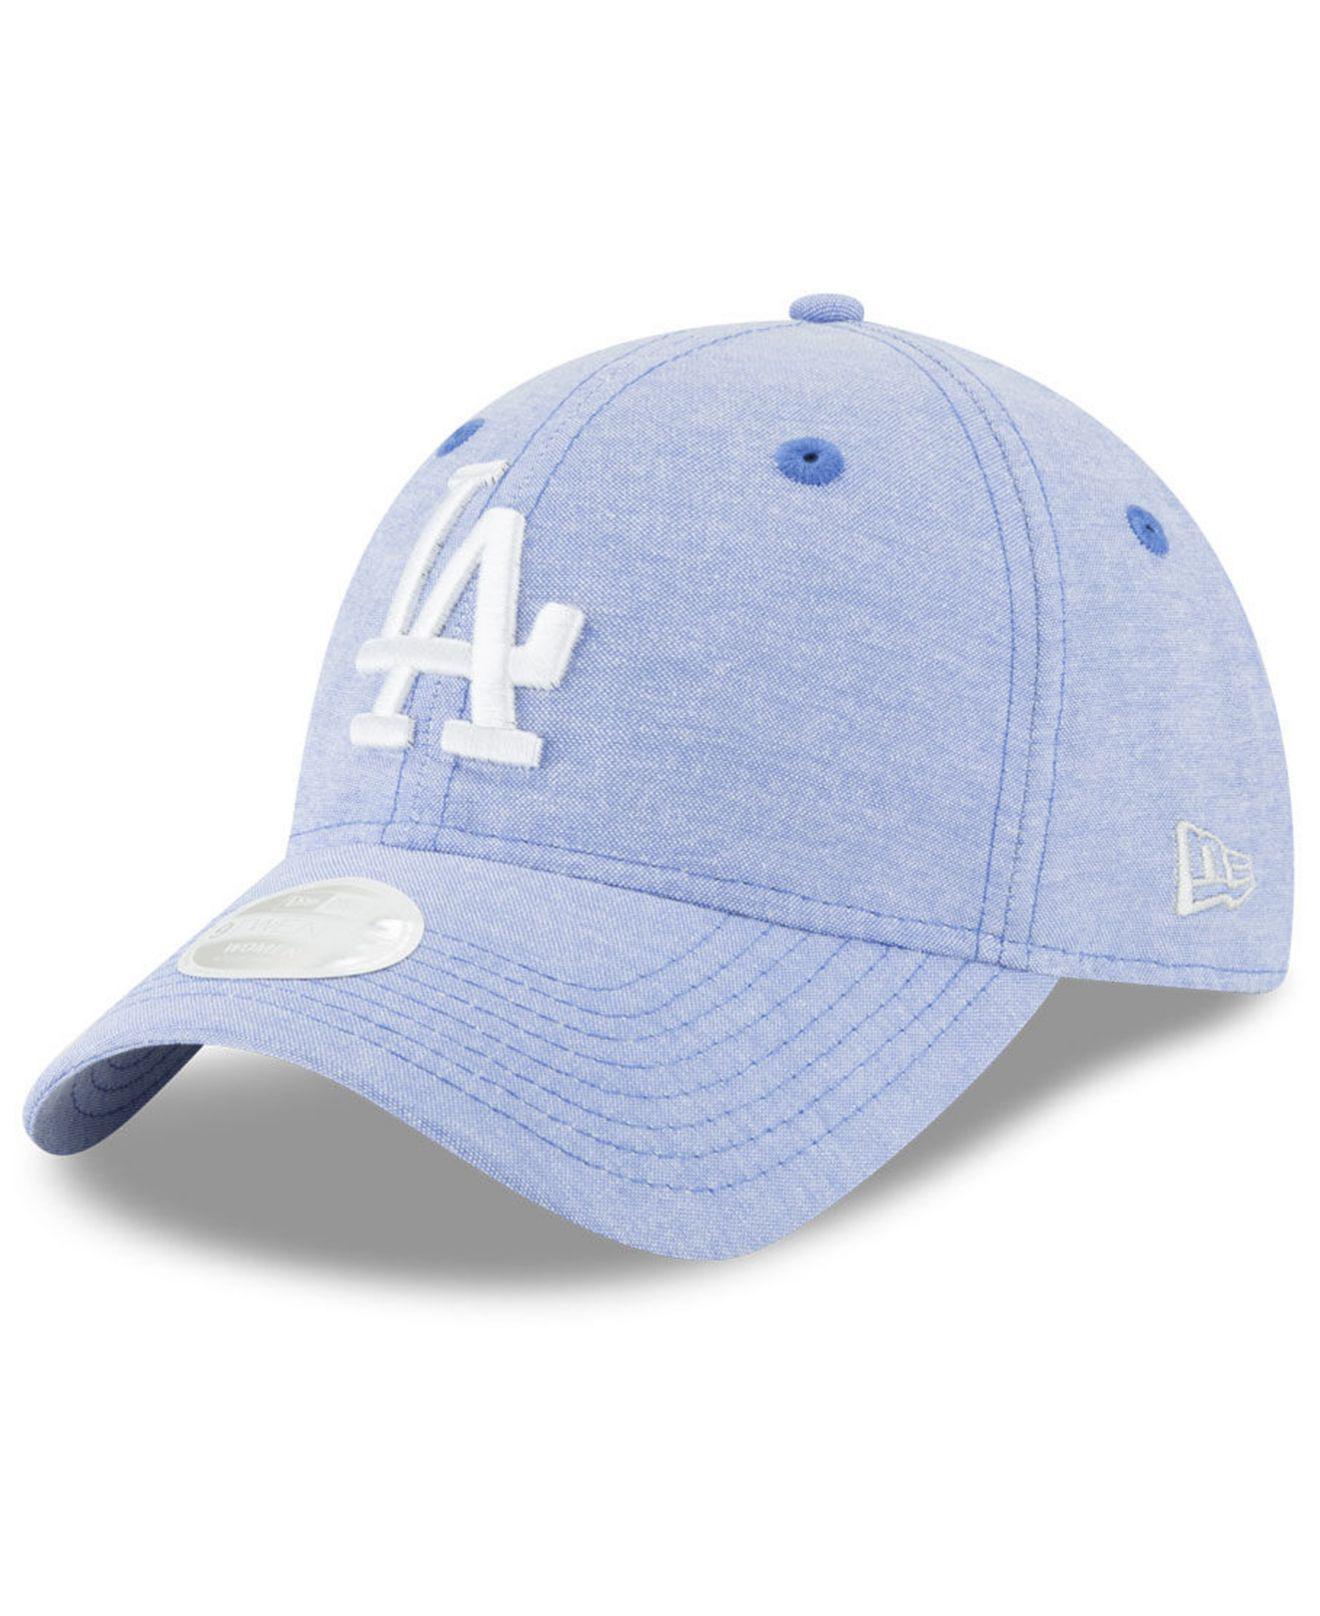 hot sale online 74168 be356 KTZ Los Angeles Dodgers Team Linen 9twenty Strapback Cap in Blue - Lyst